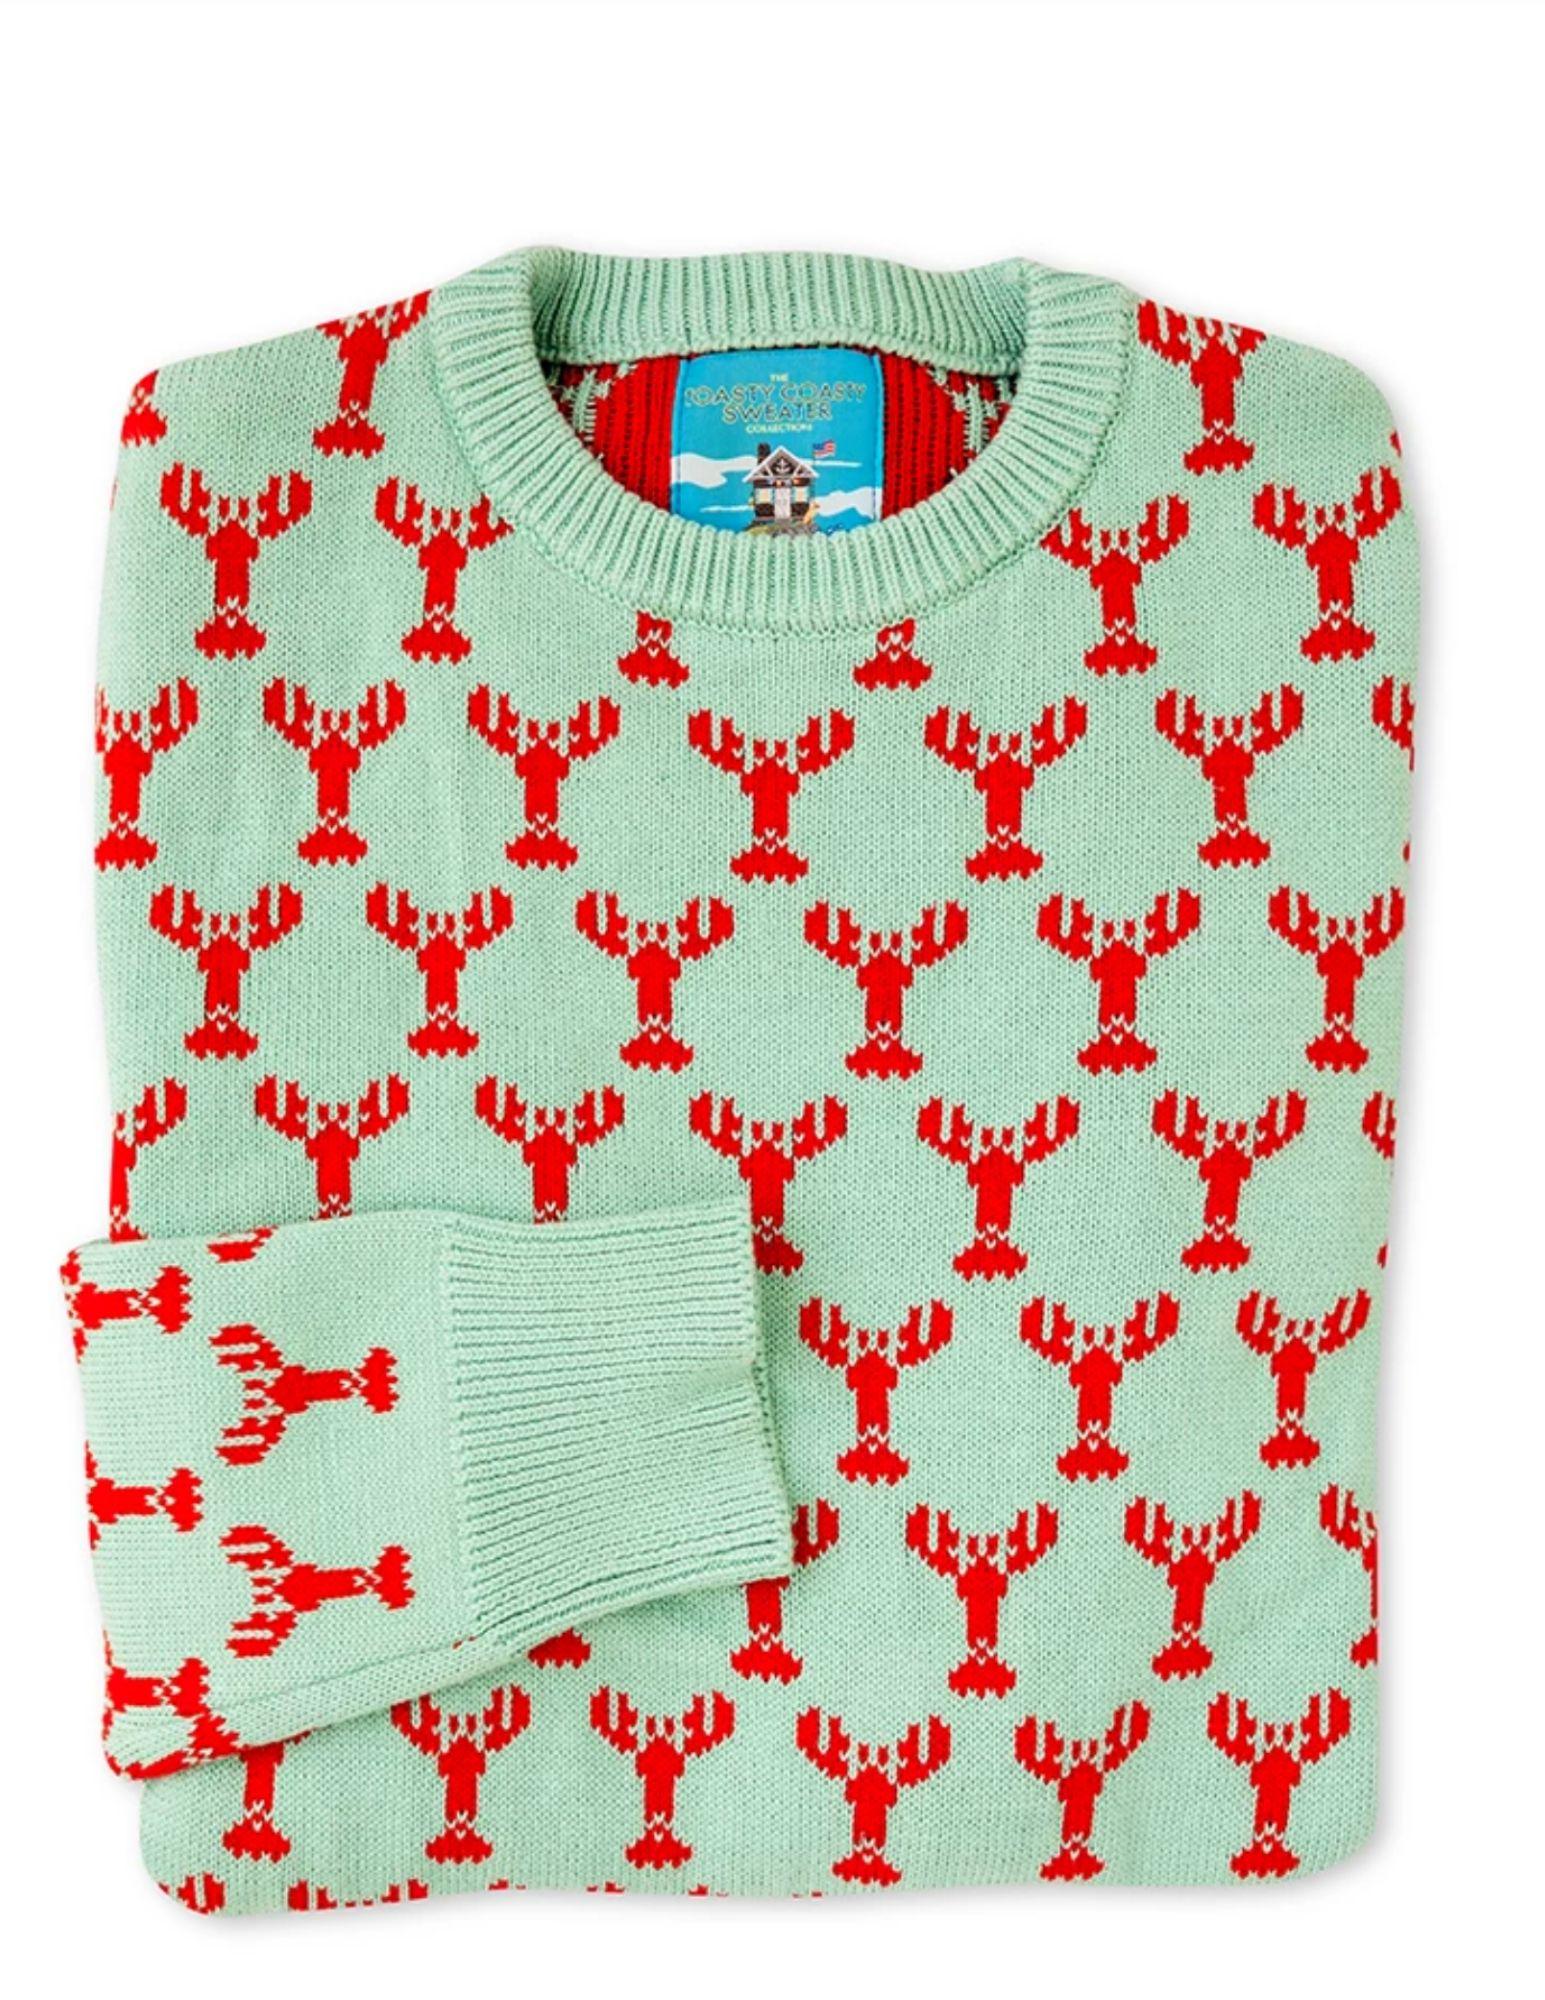 Reel in the Freshest Catch Sweater from Kiel James Patrick